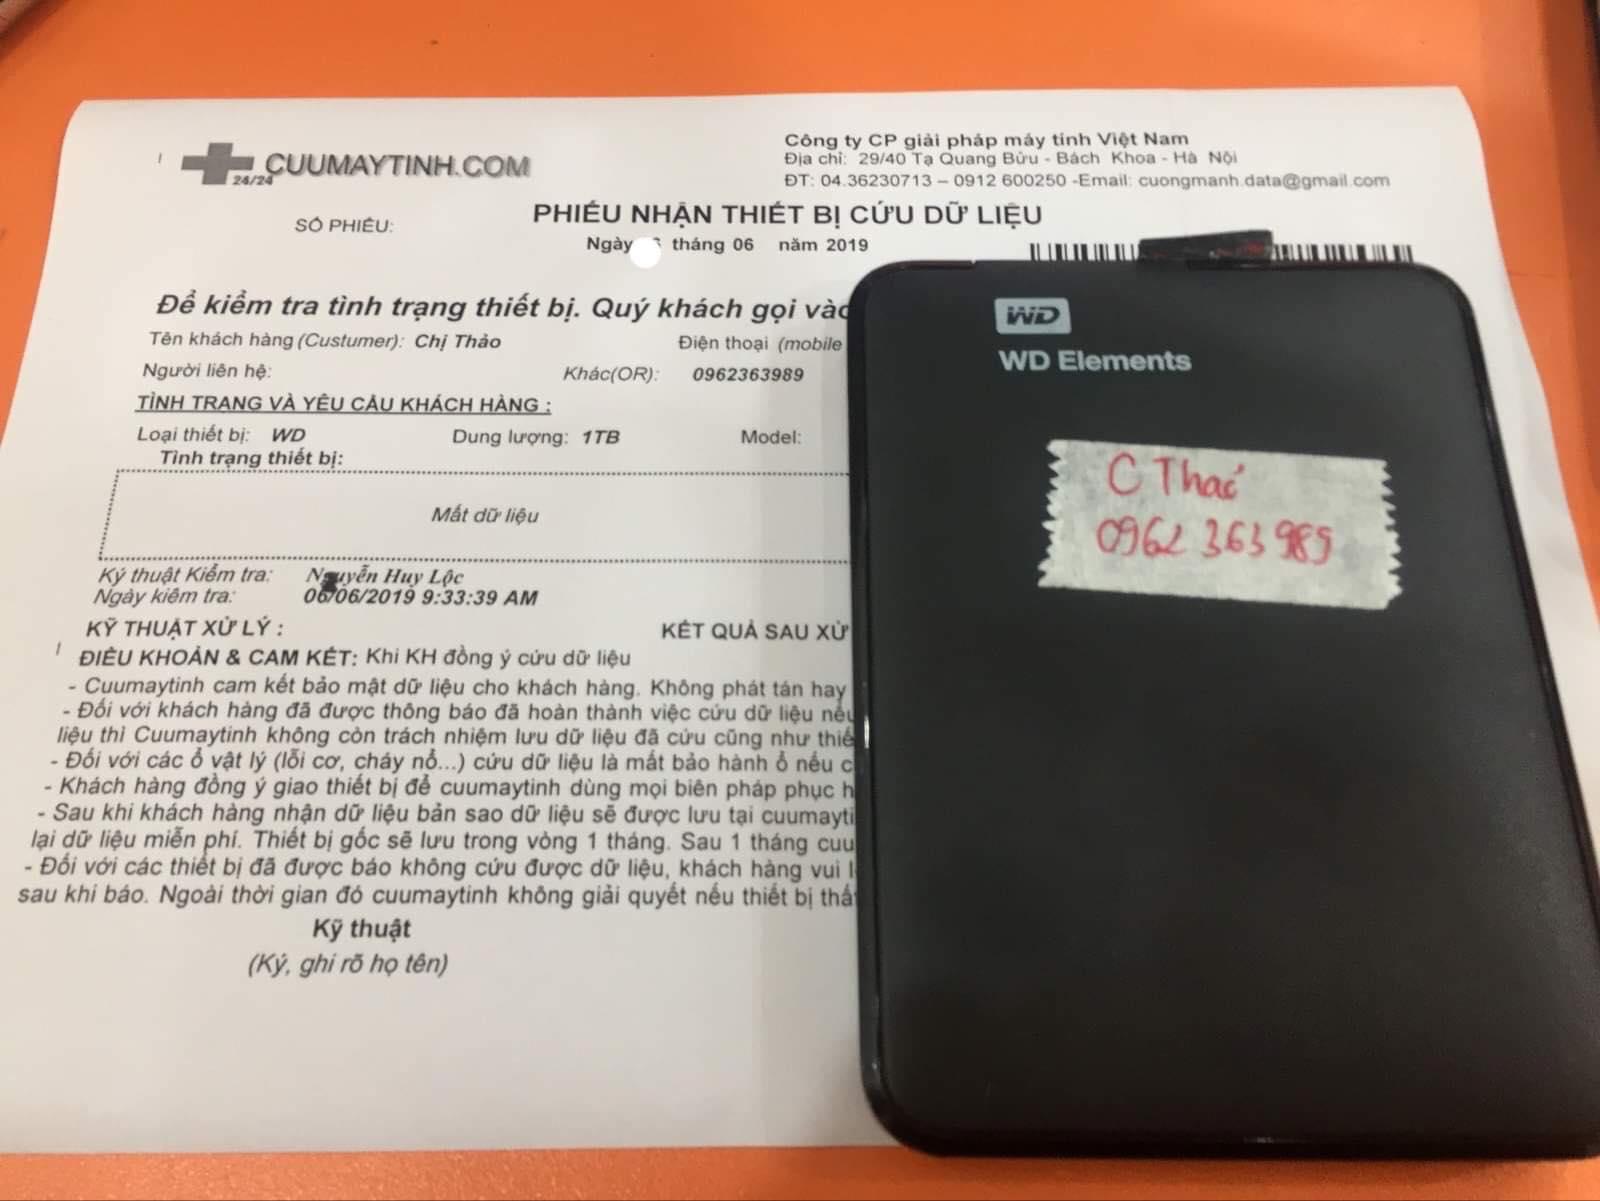 Cứu dữ liệu ổ cứng Western 1TB mất dữ liệu 11/06/2019 - cuumaytinh